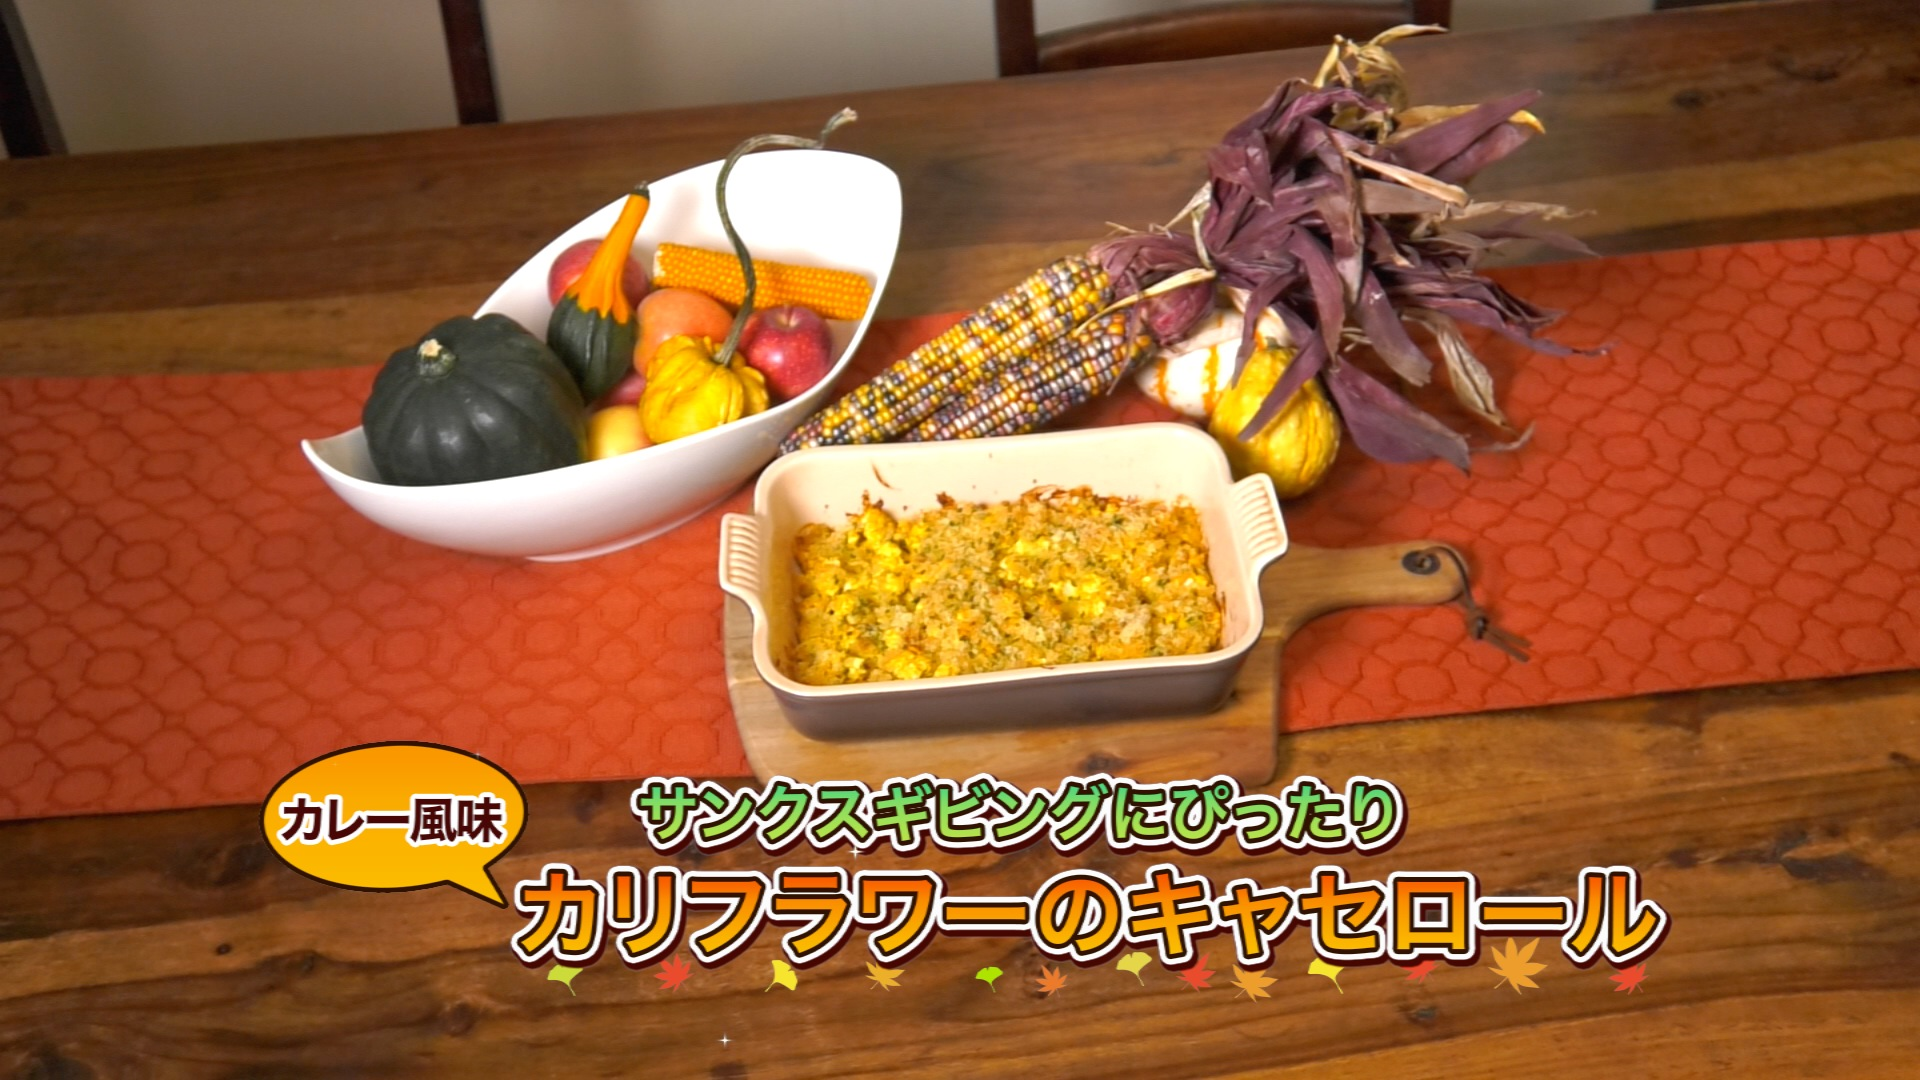 Image: カレー風味のカリフラワーキャセロールのレシピ